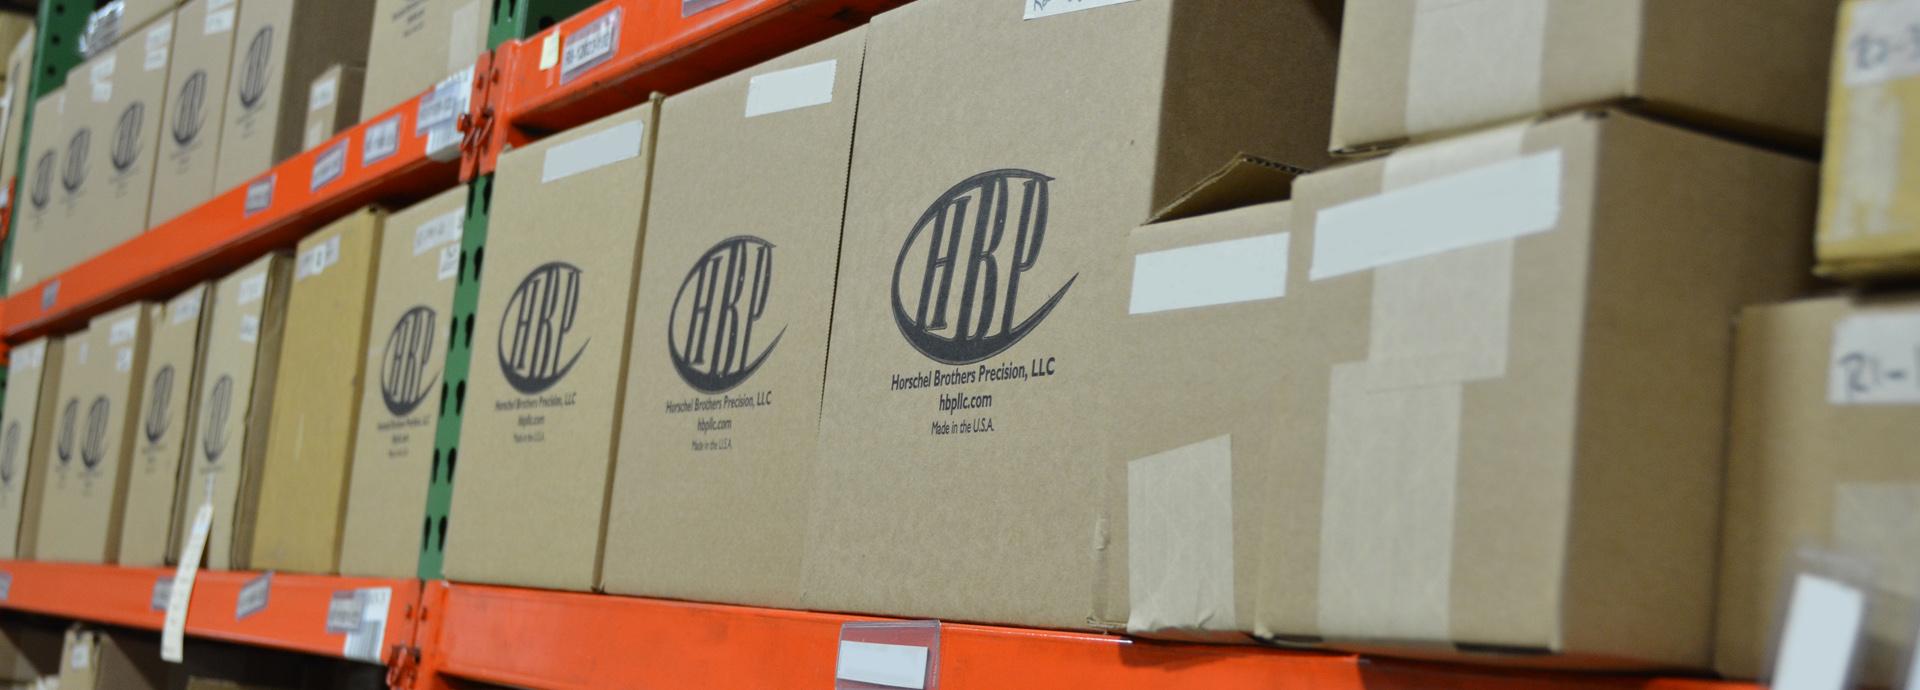 Inventory Management | Horschel Brothers Precision